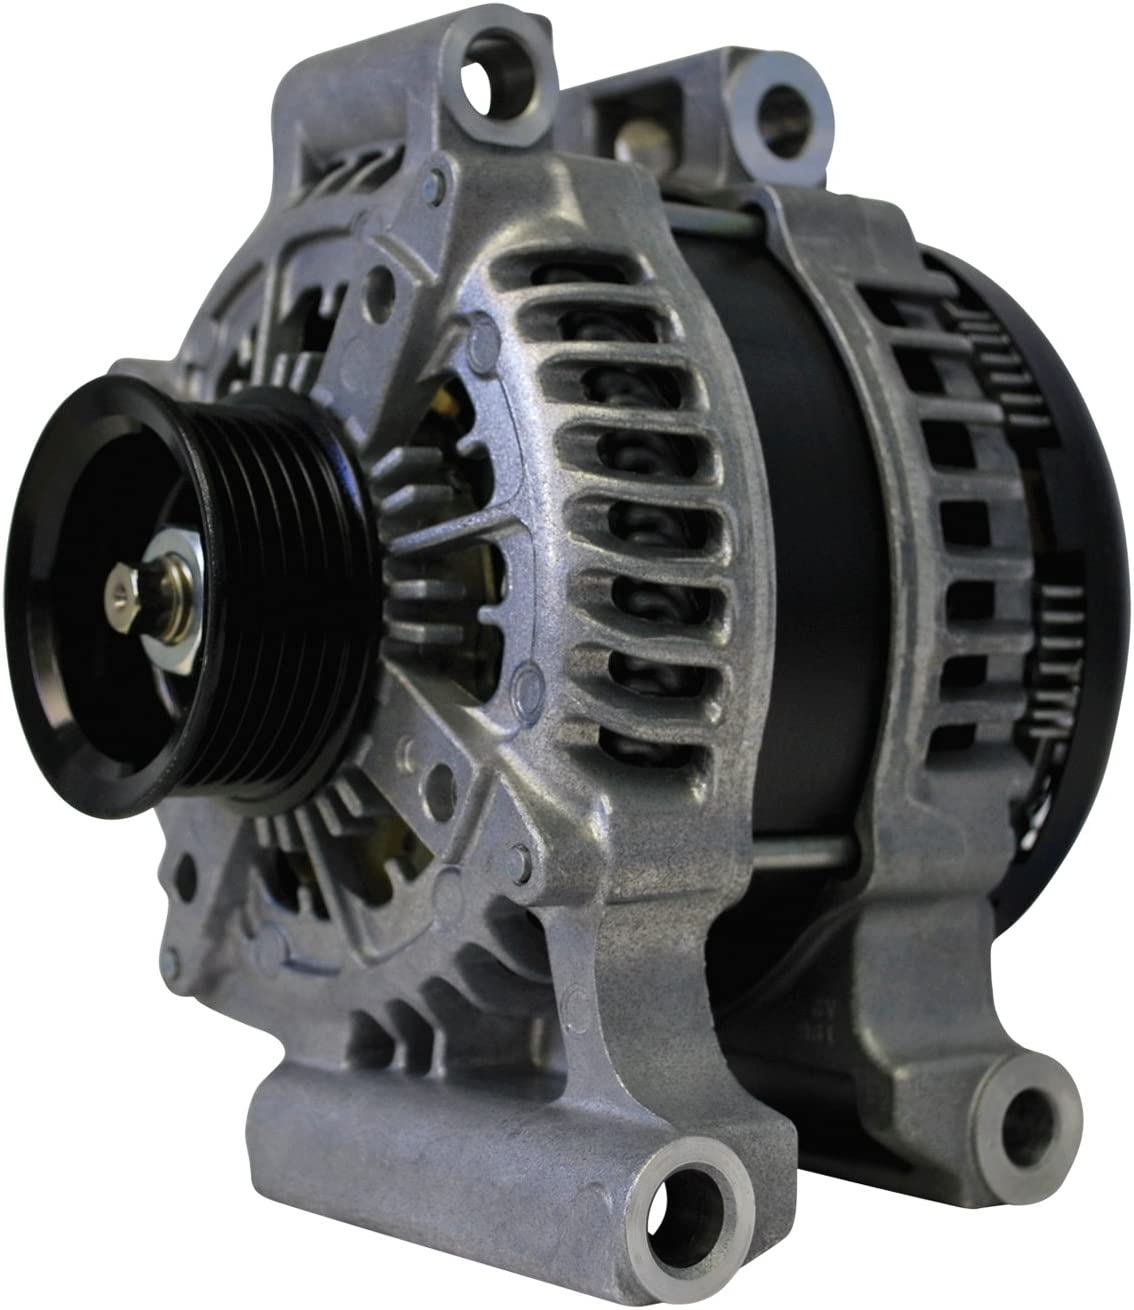 Remanufactured ACDelco 334-2914 Professional Alternator